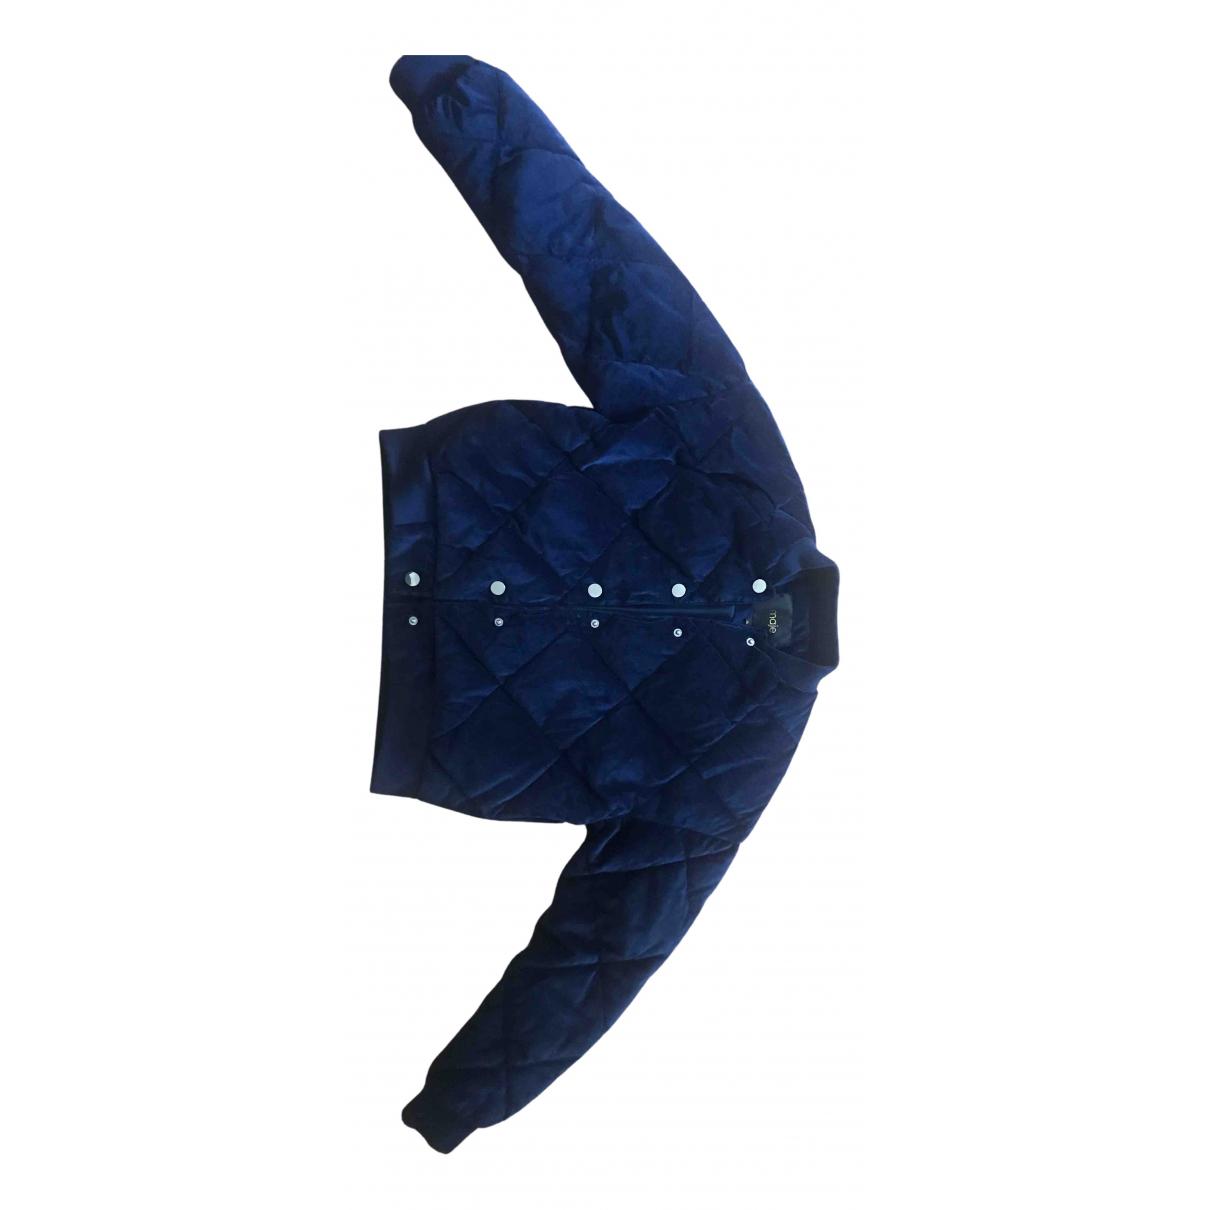 Maje - Veste Fall Winter 2019 pour femme en velours - bleu